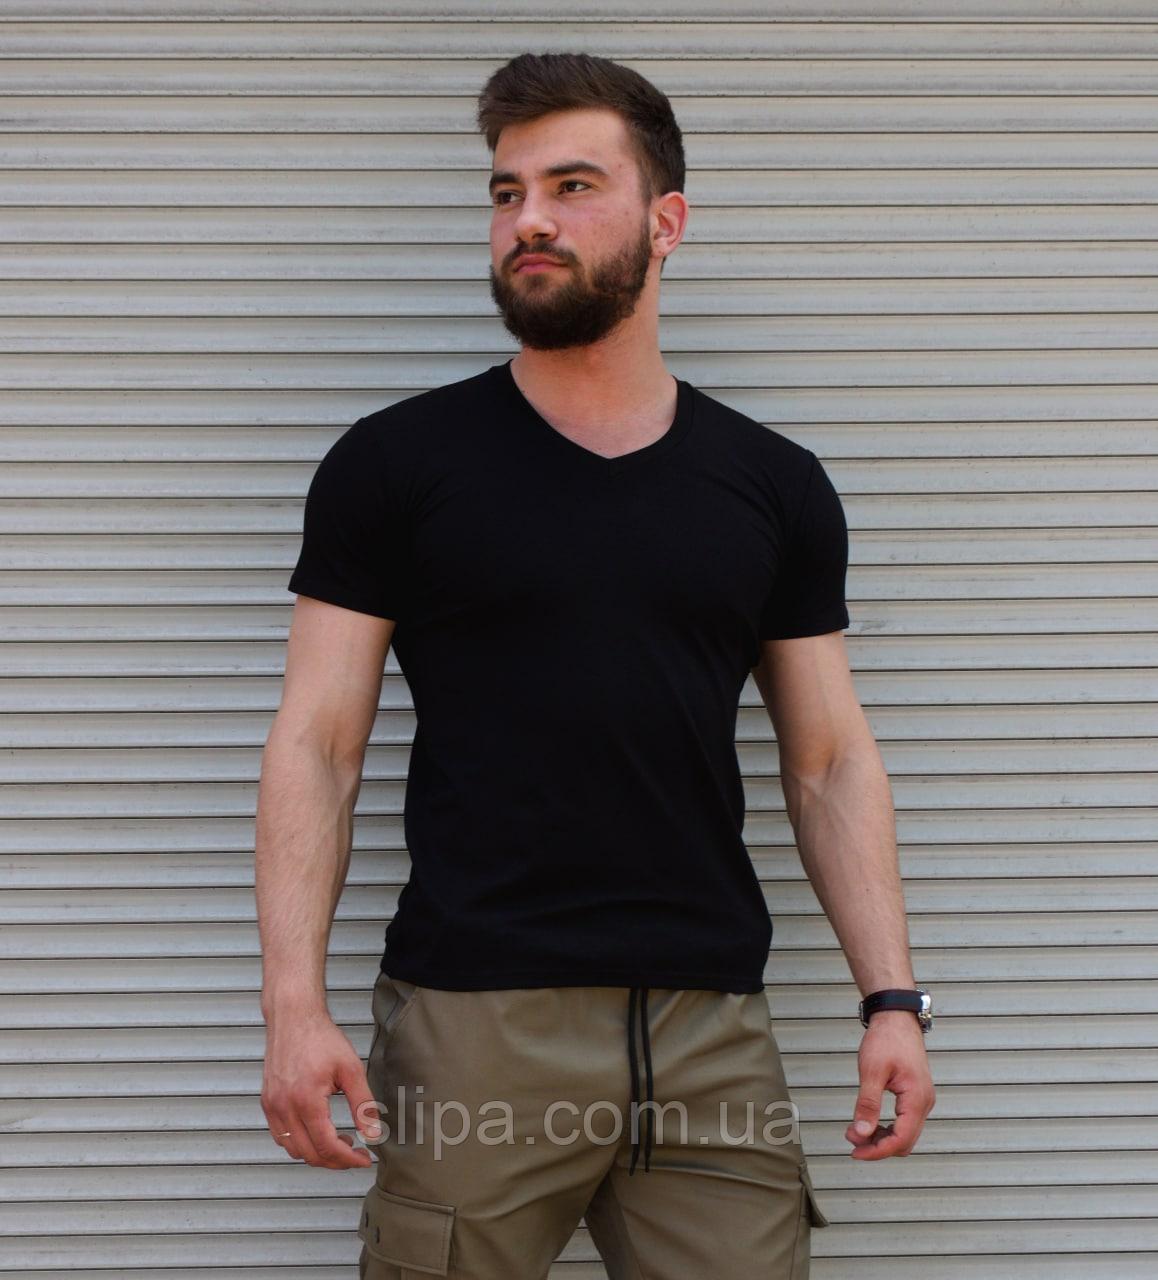 Мужская черная футболка однотонная, вырез мыс